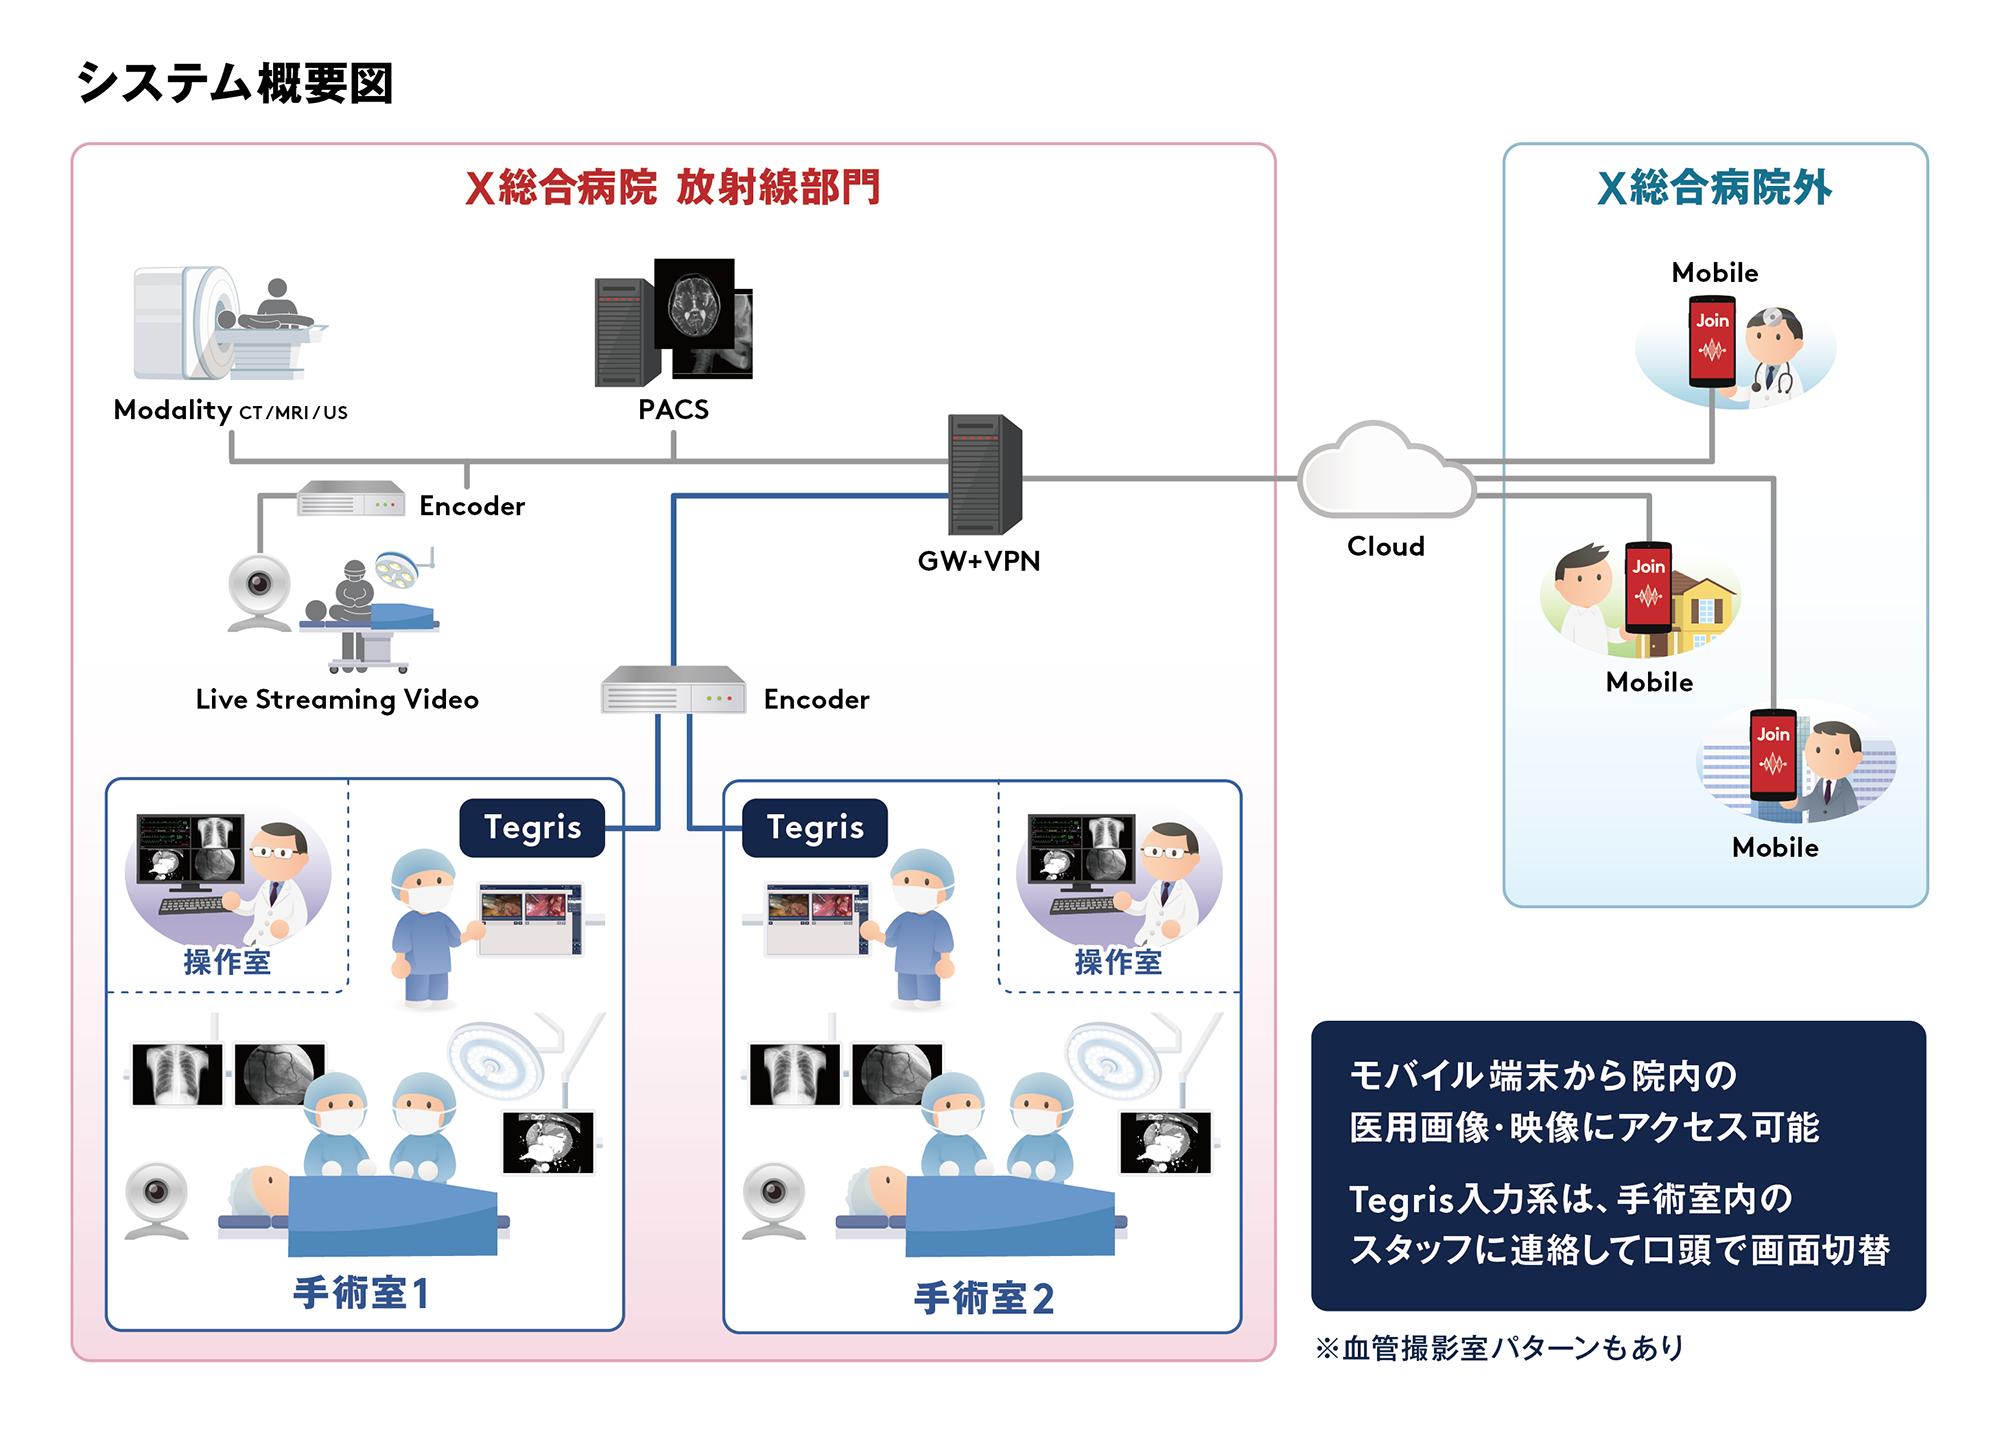 Join と Tegris のシステム概要図